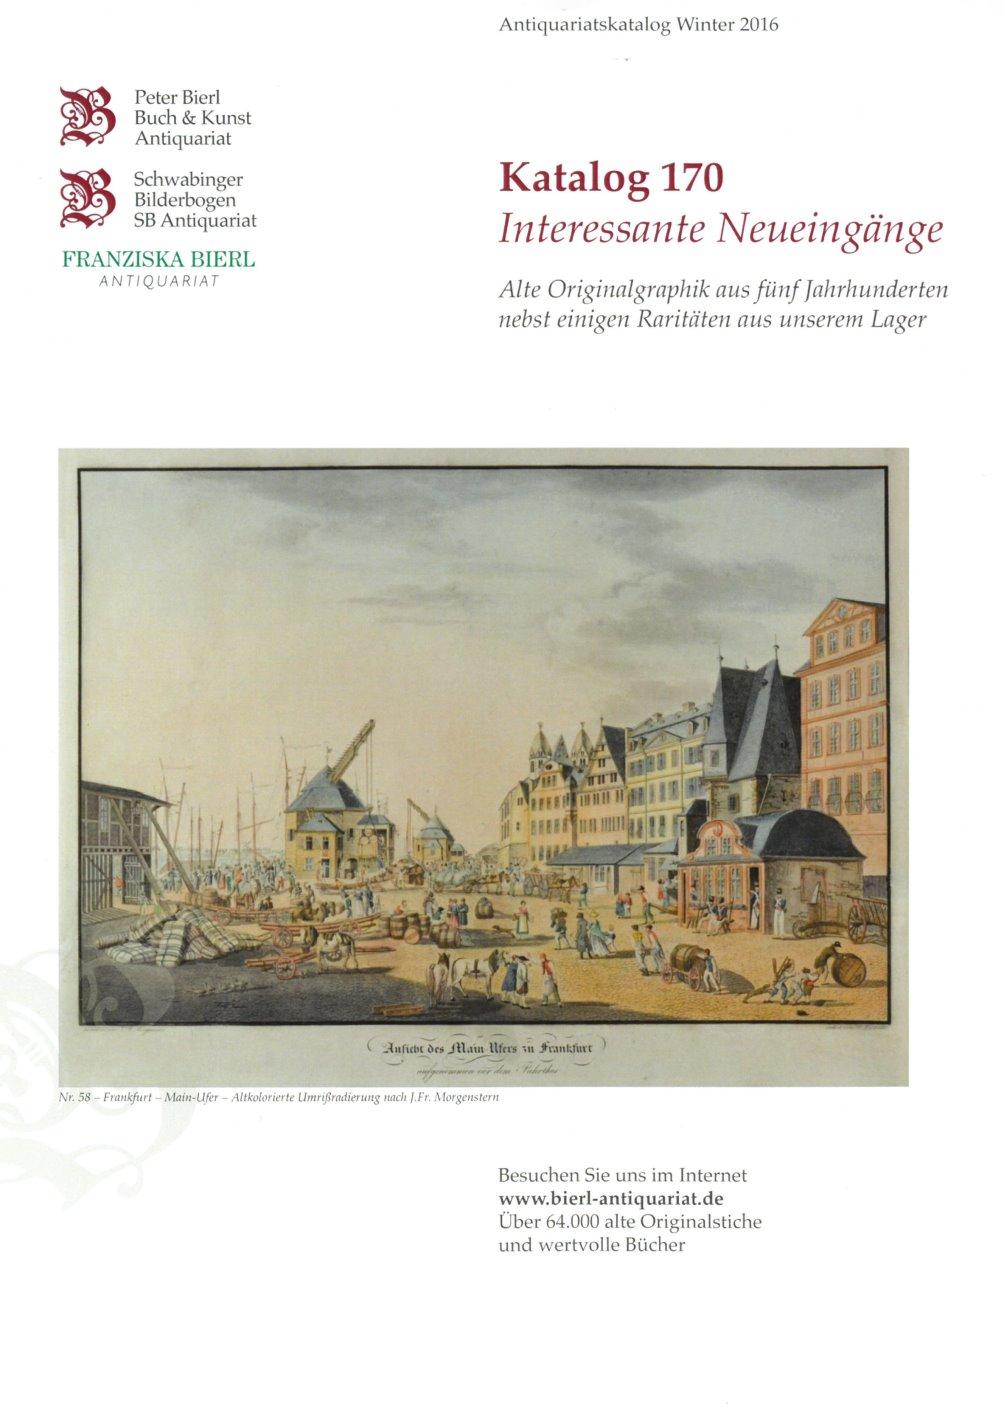 Katalog 170 - Interessante Neueingänge